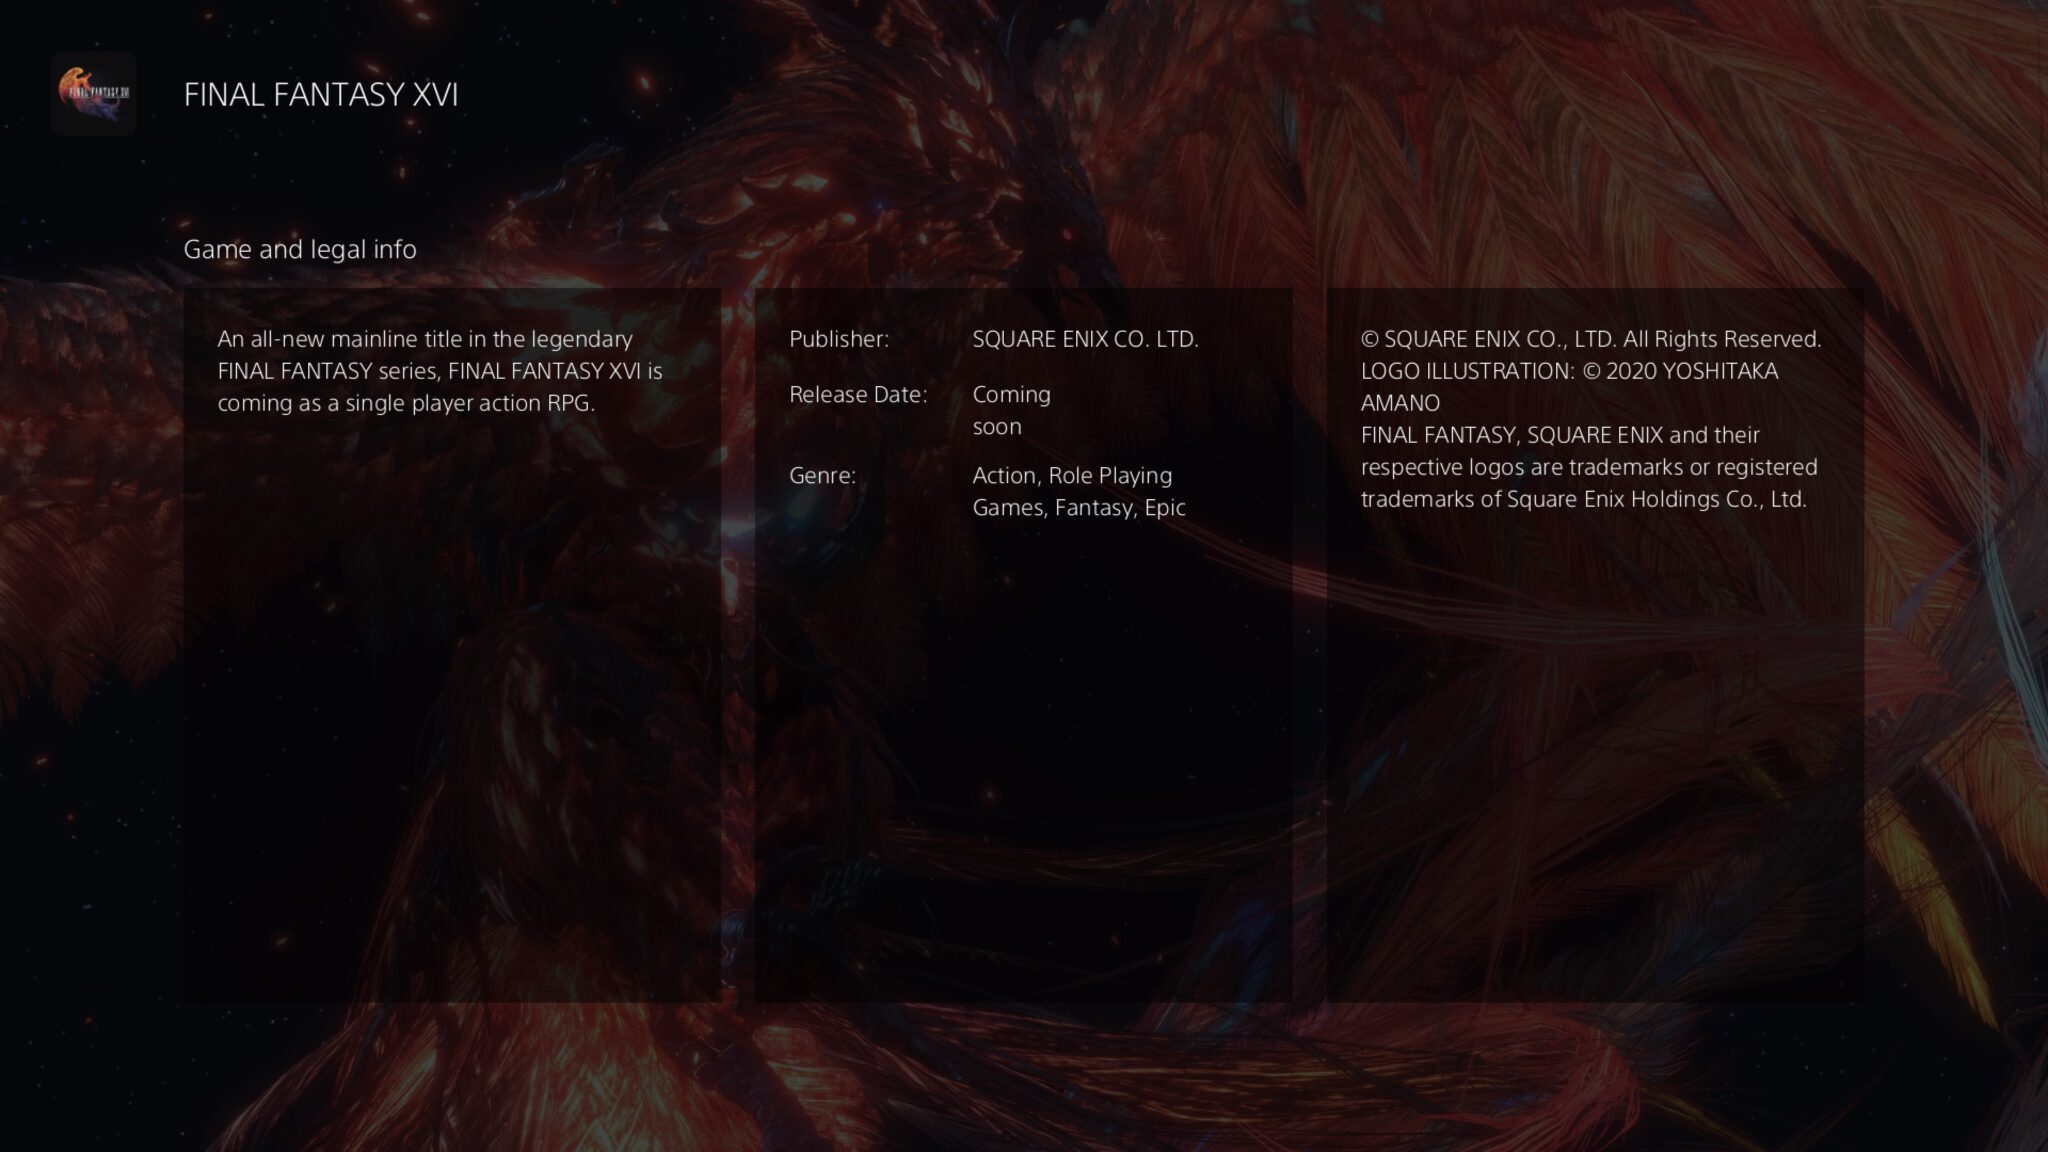 final-fantasy-xvi-release-date-2-2048x1152.jpg